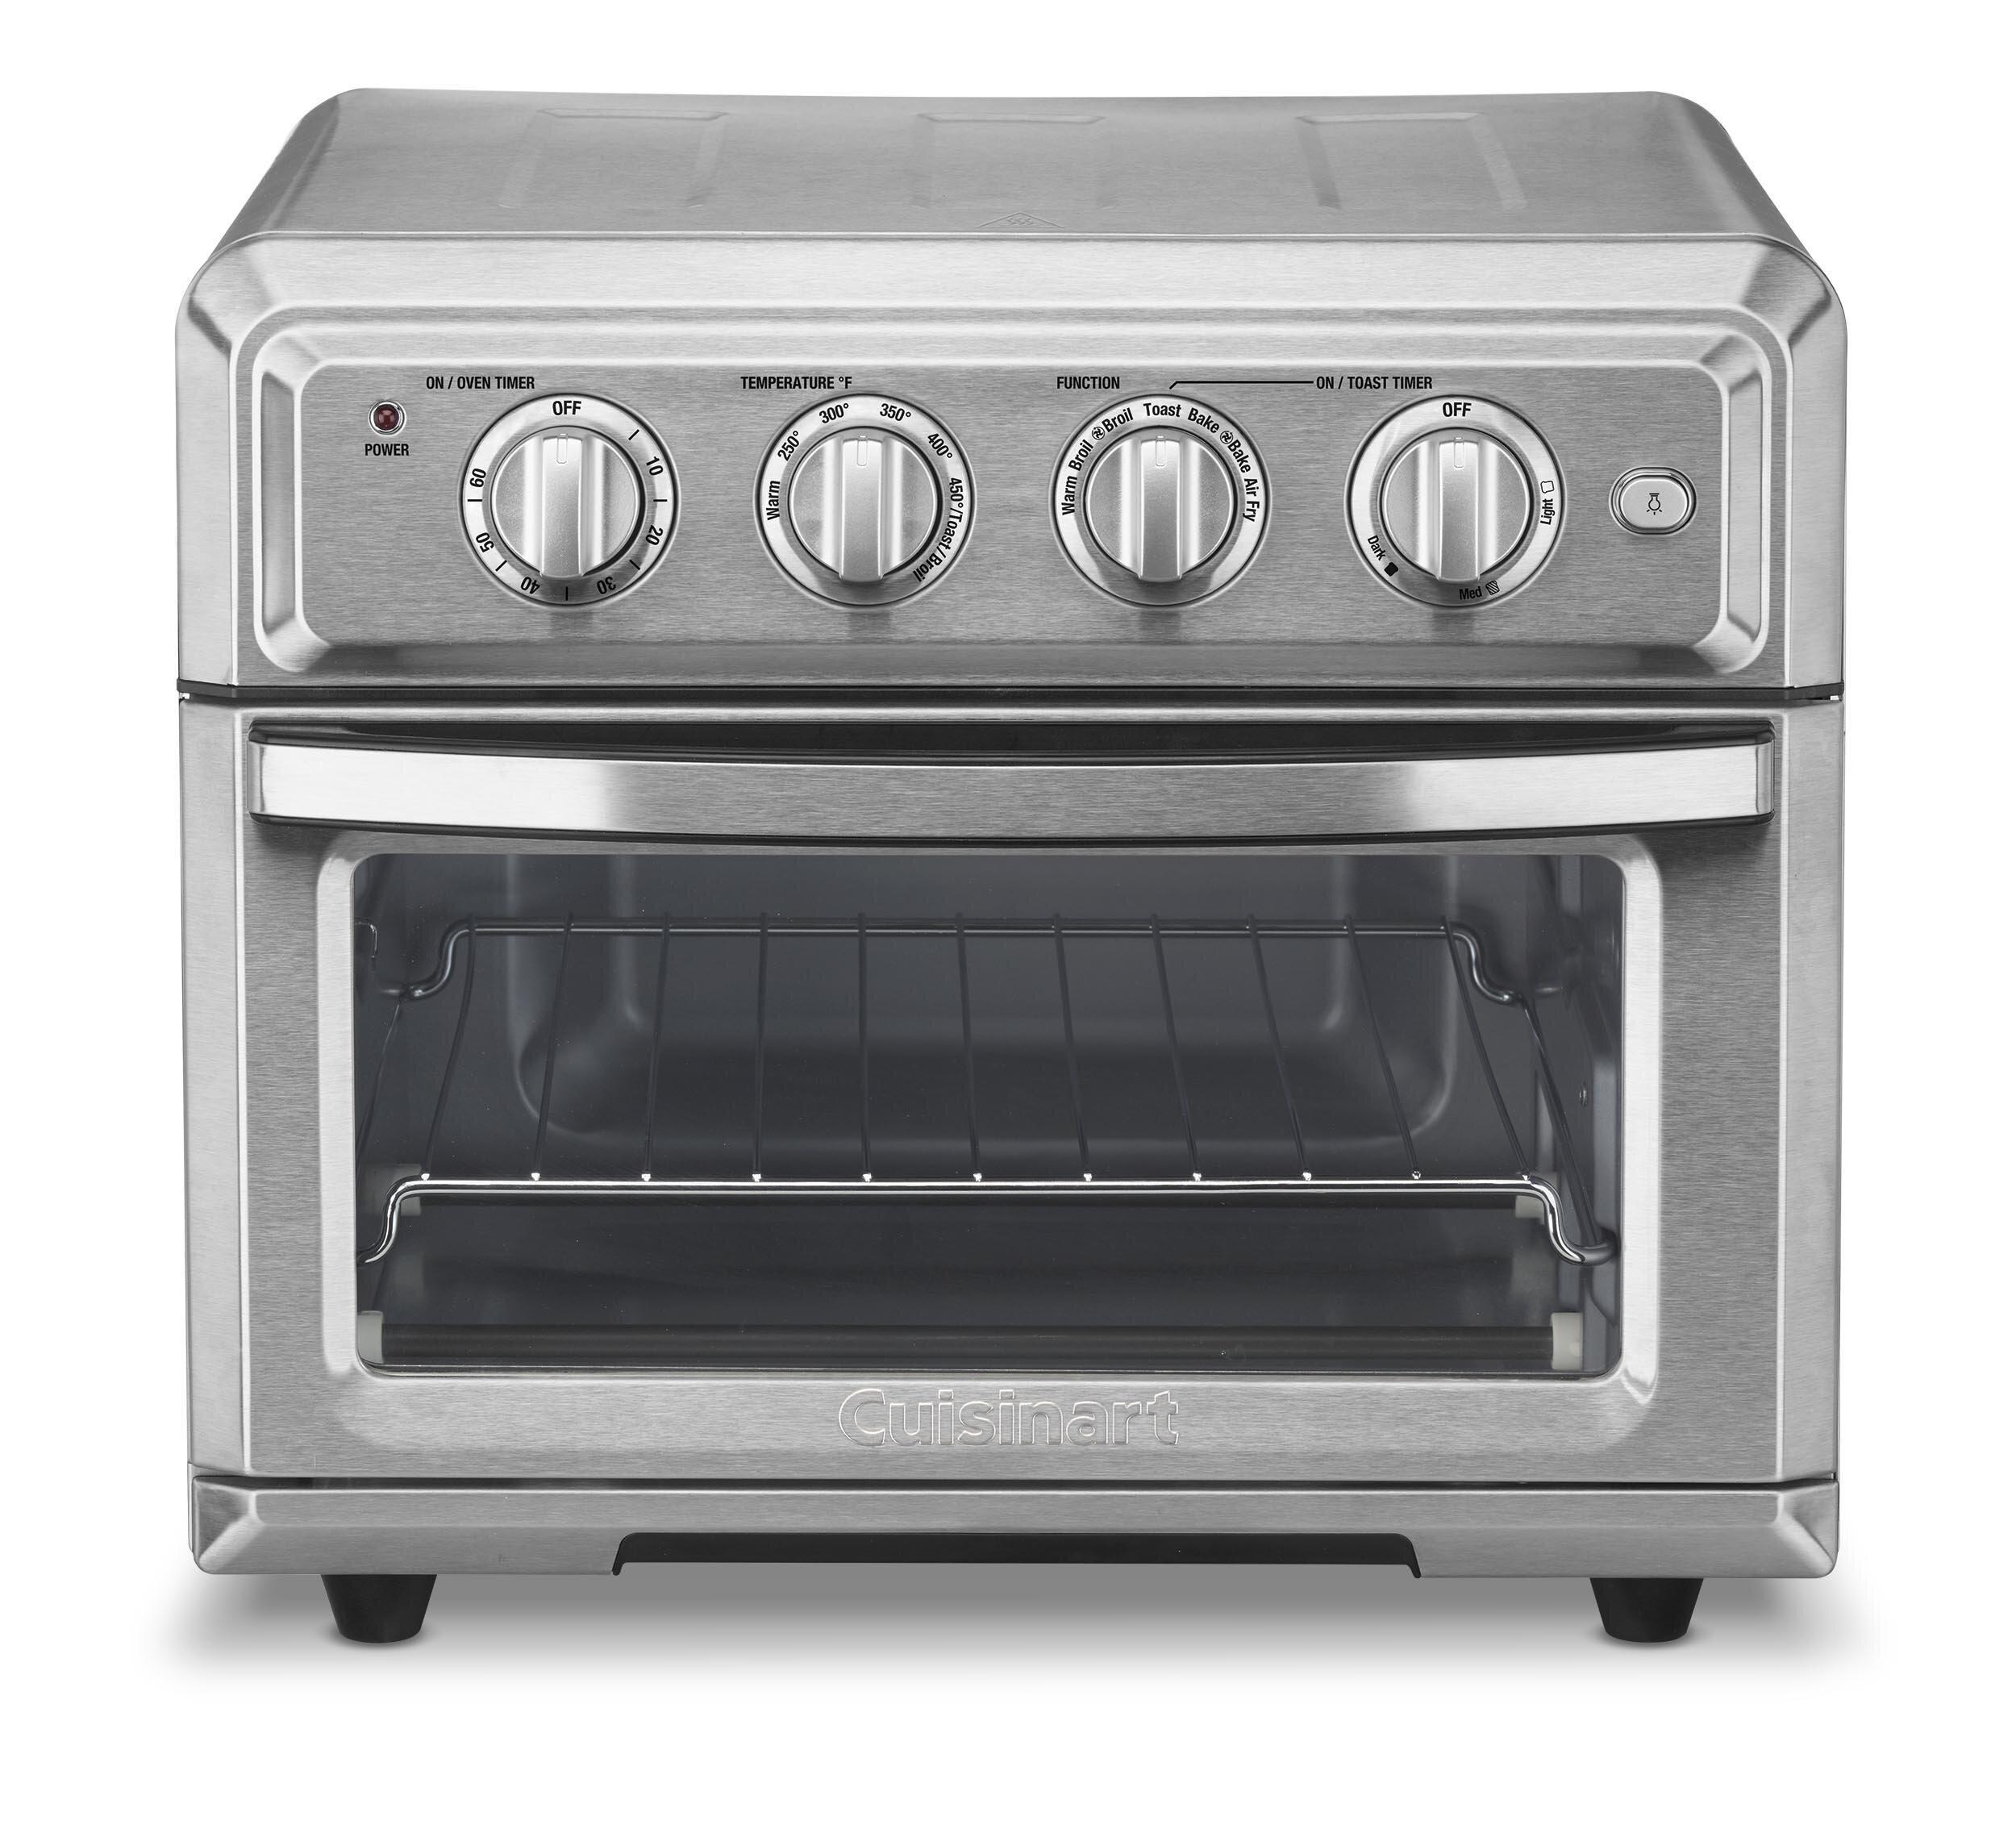 Cuisinart 0 6 Cu Ft Air Fryer Toaster Oven Amp Reviews